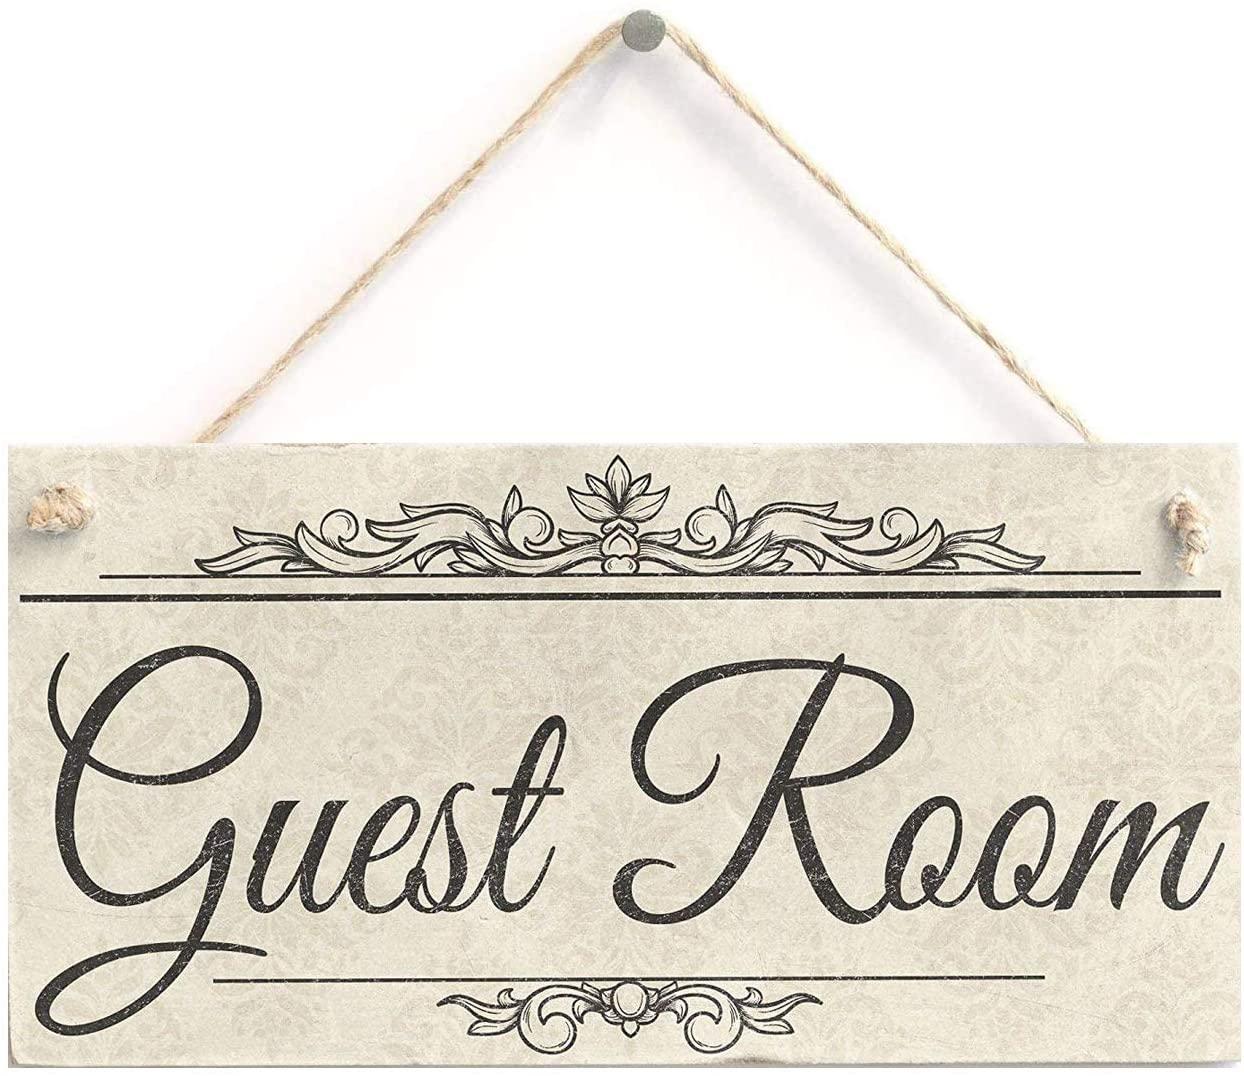 Guest Room - Rustic Sign Plaque 10